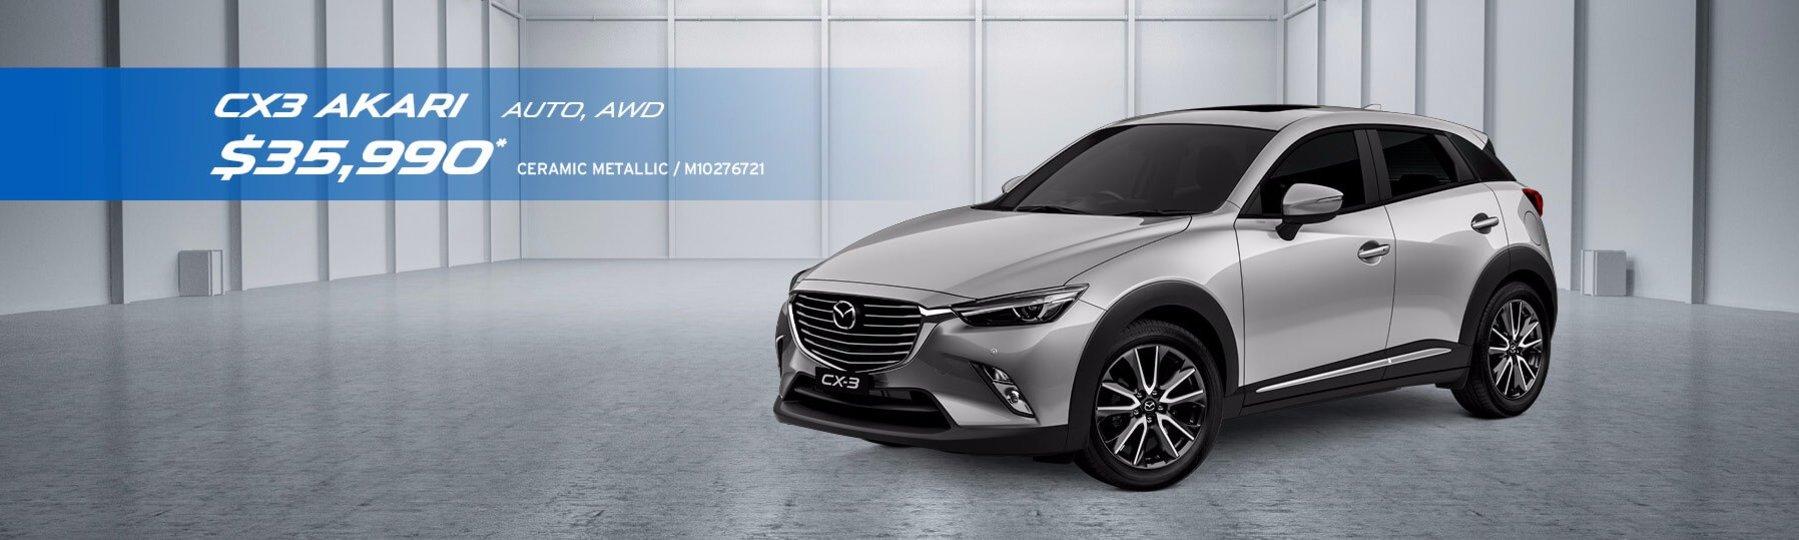 100 Mazda Dealership Locations